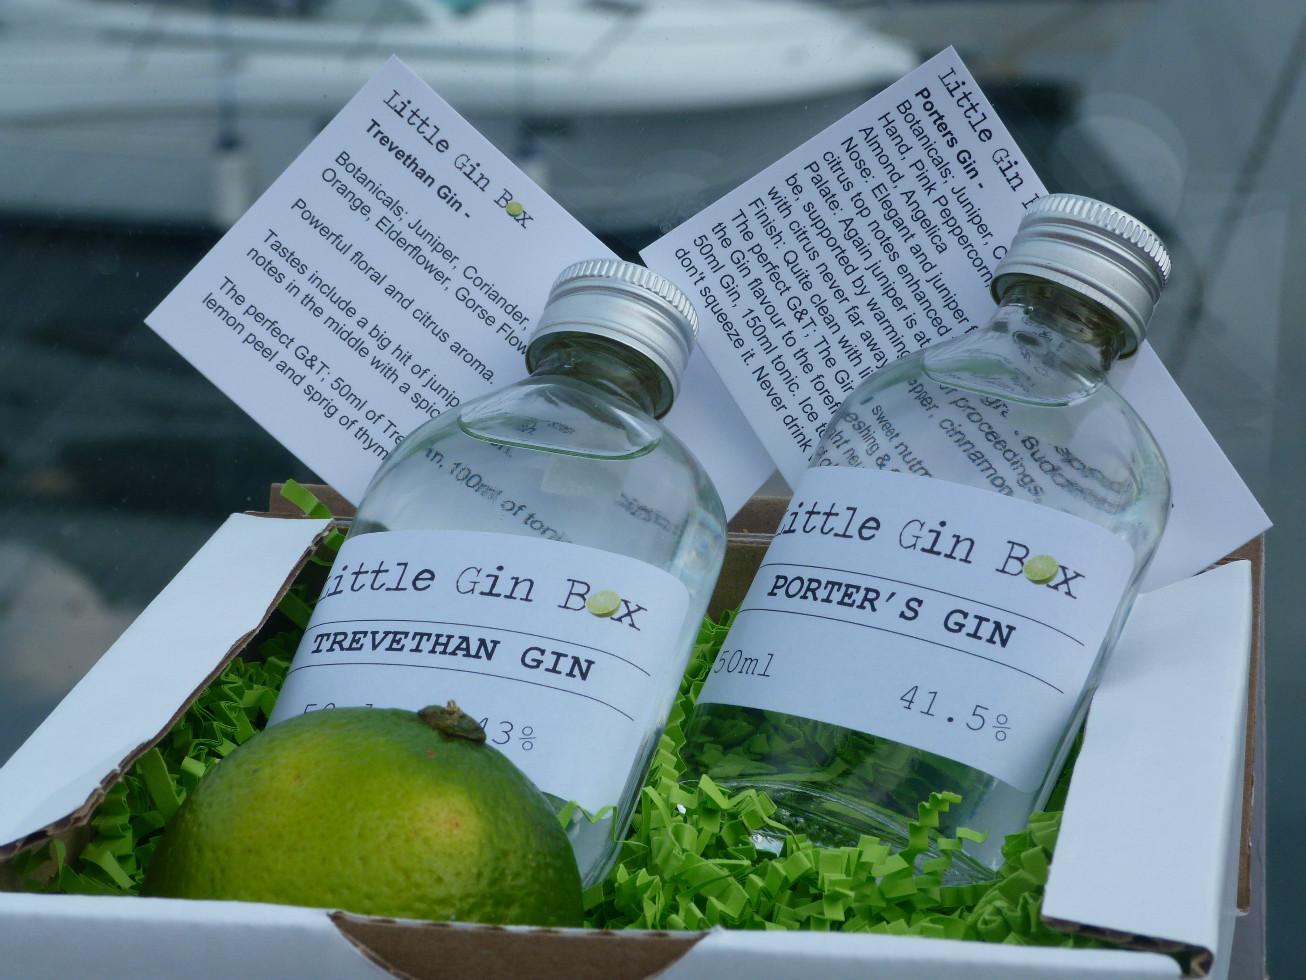 Little-Gin-Box-subscription-box